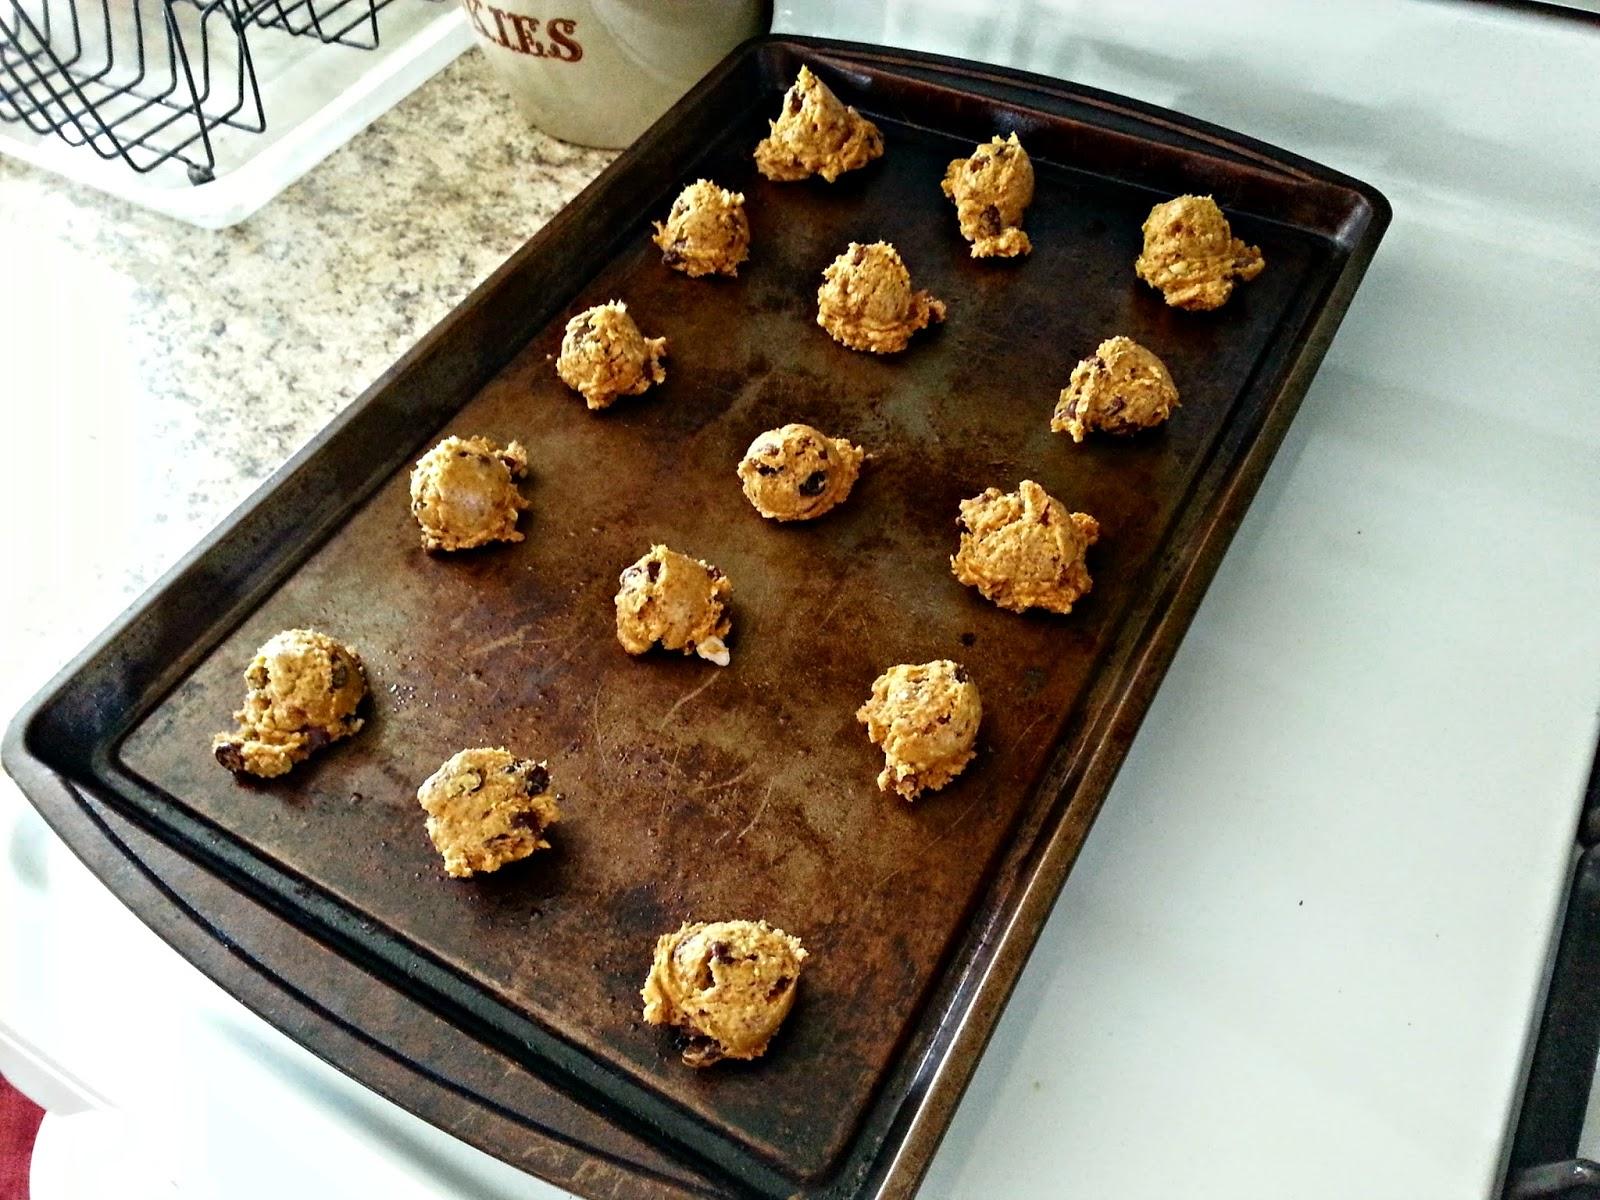 Pumpkin-Oatmeal Chocolate Chip Raisin Cookies - A Healthy Version